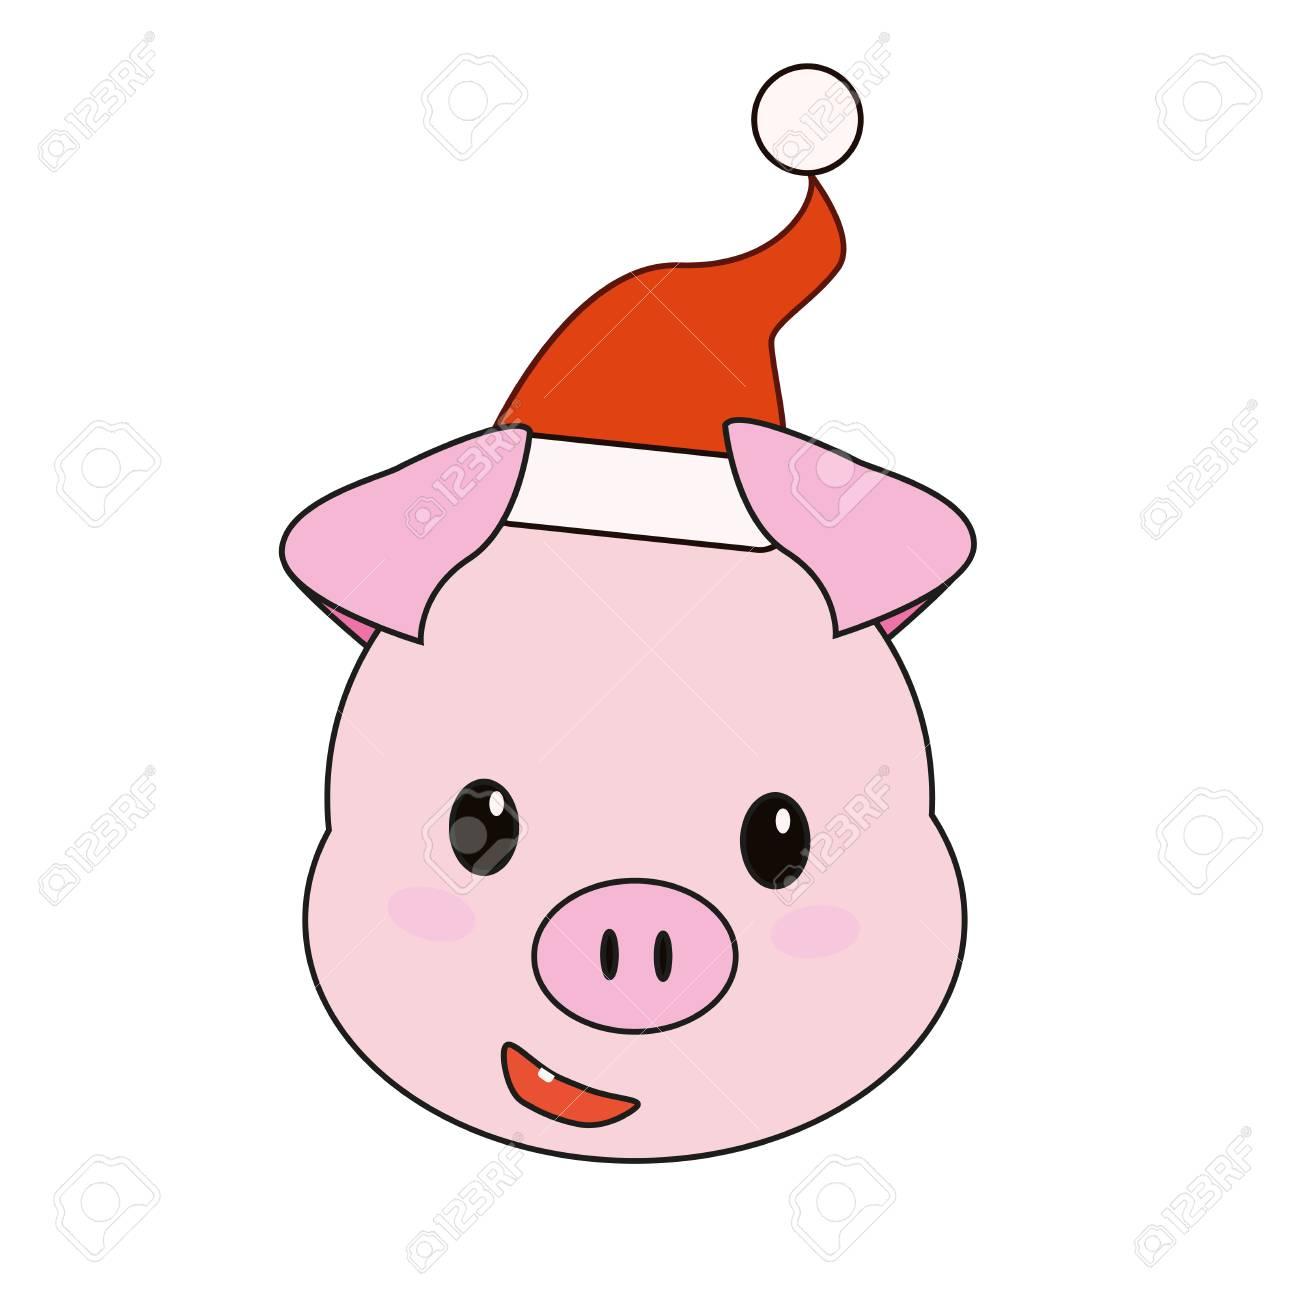 Christmas Pig.Christmas Pink Pig In A Santa Hat